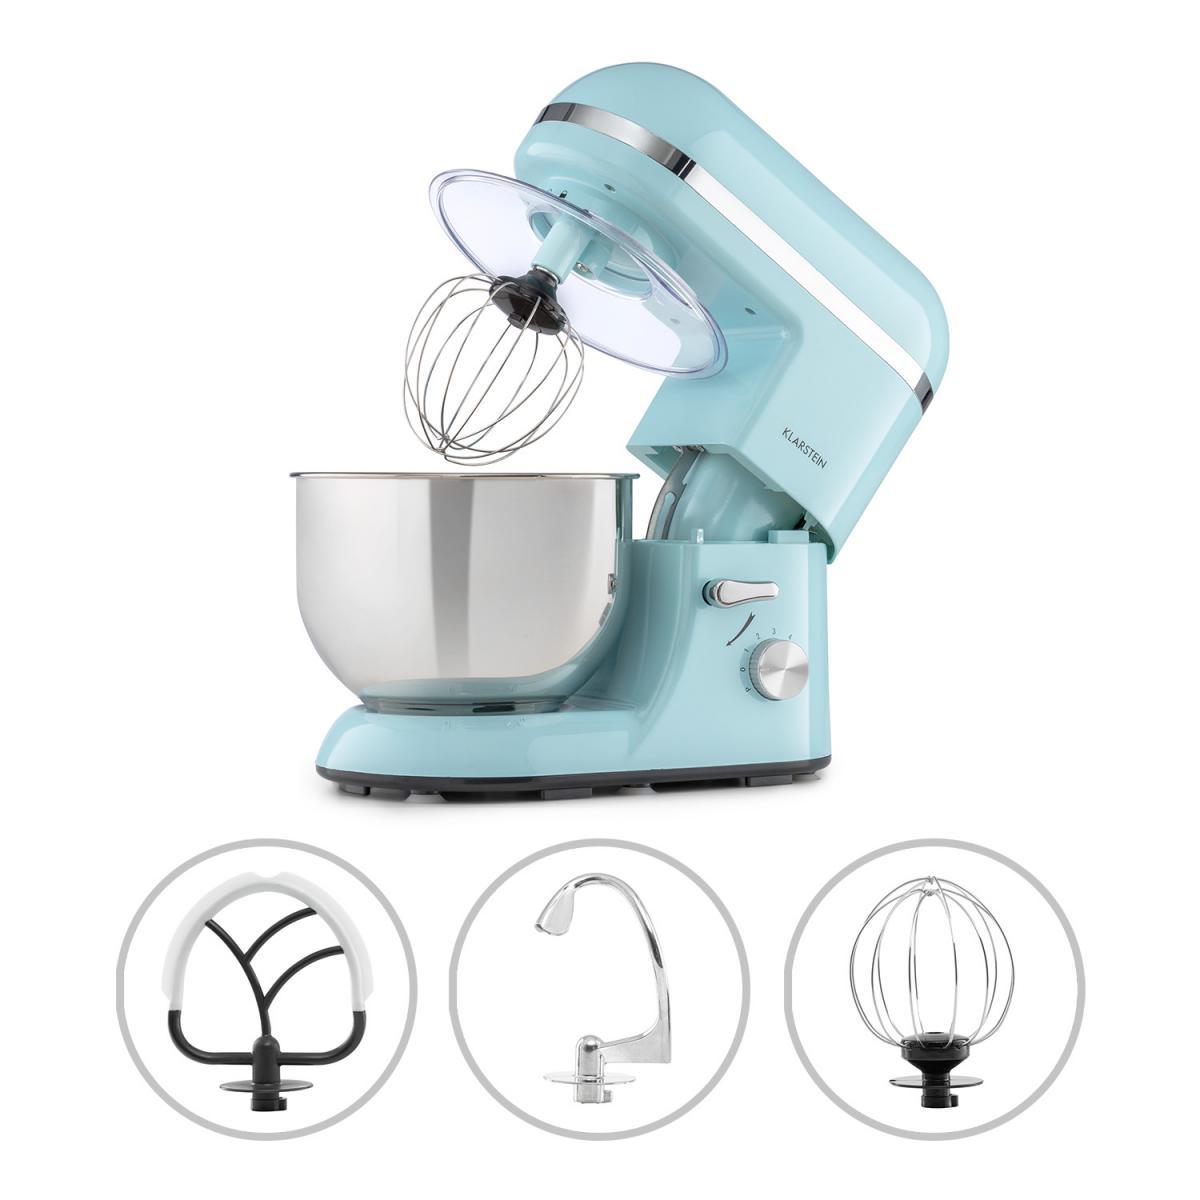 Klarstein Klarstein Bella Elegance - Robot de cuisine 1300W, bol mélangeur inox 5L, 6 vitesses - Bleu